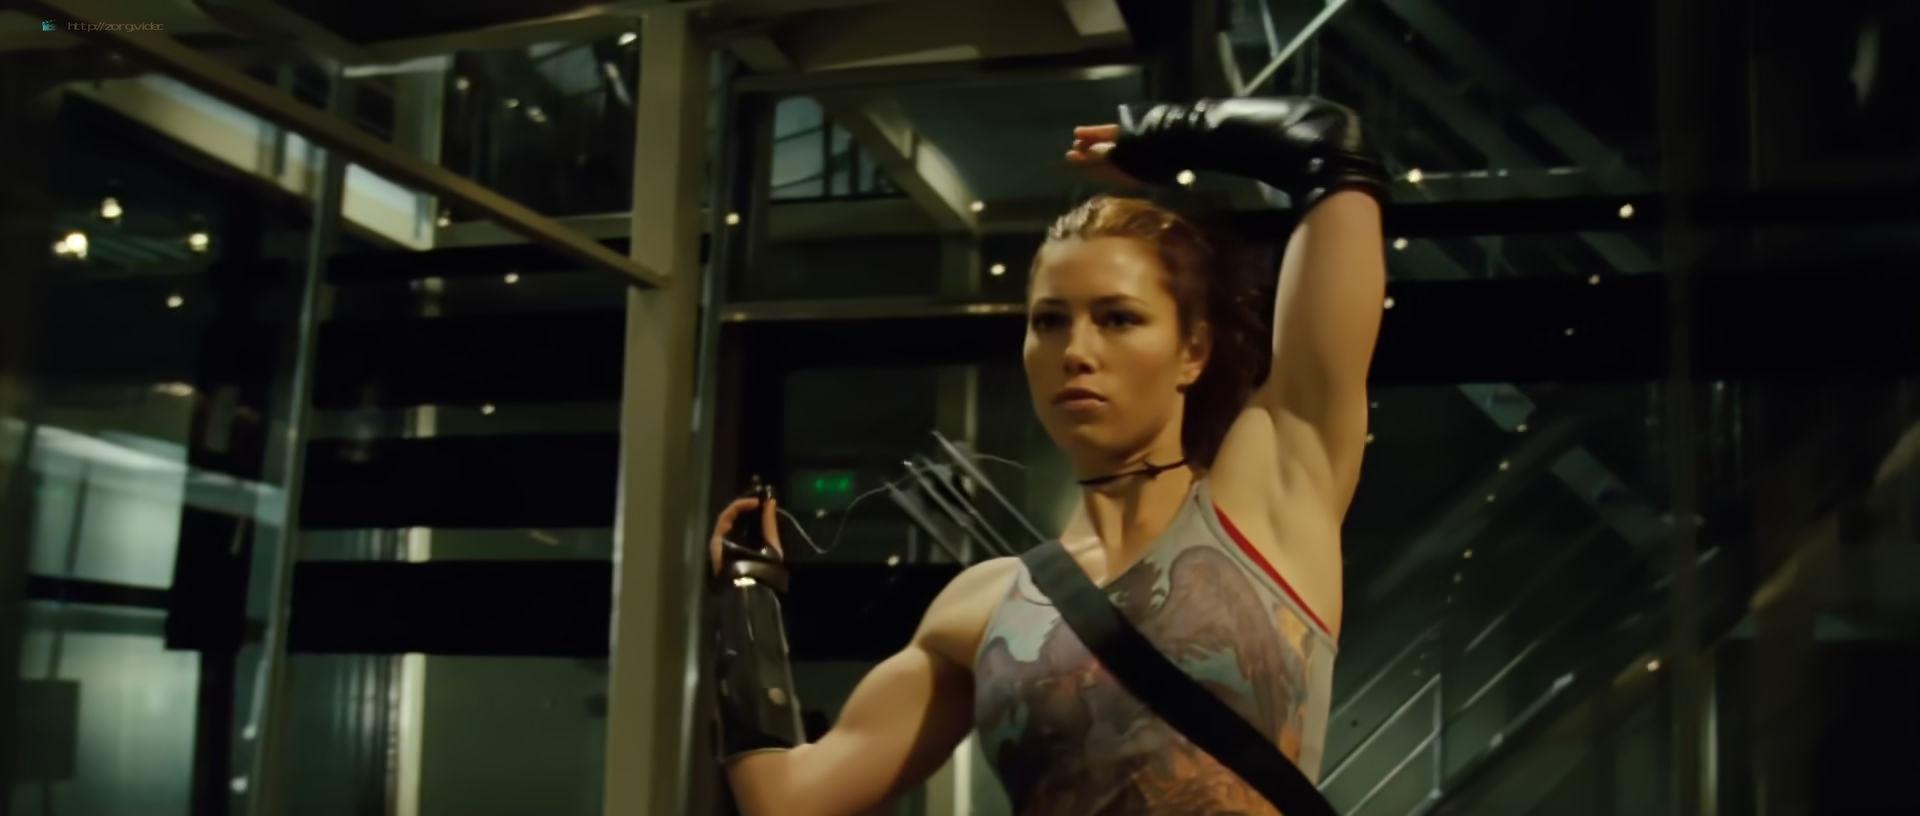 Jessica Biel hot and sexy - Blade Trinity (2004) HD 1080p BluRay (8)